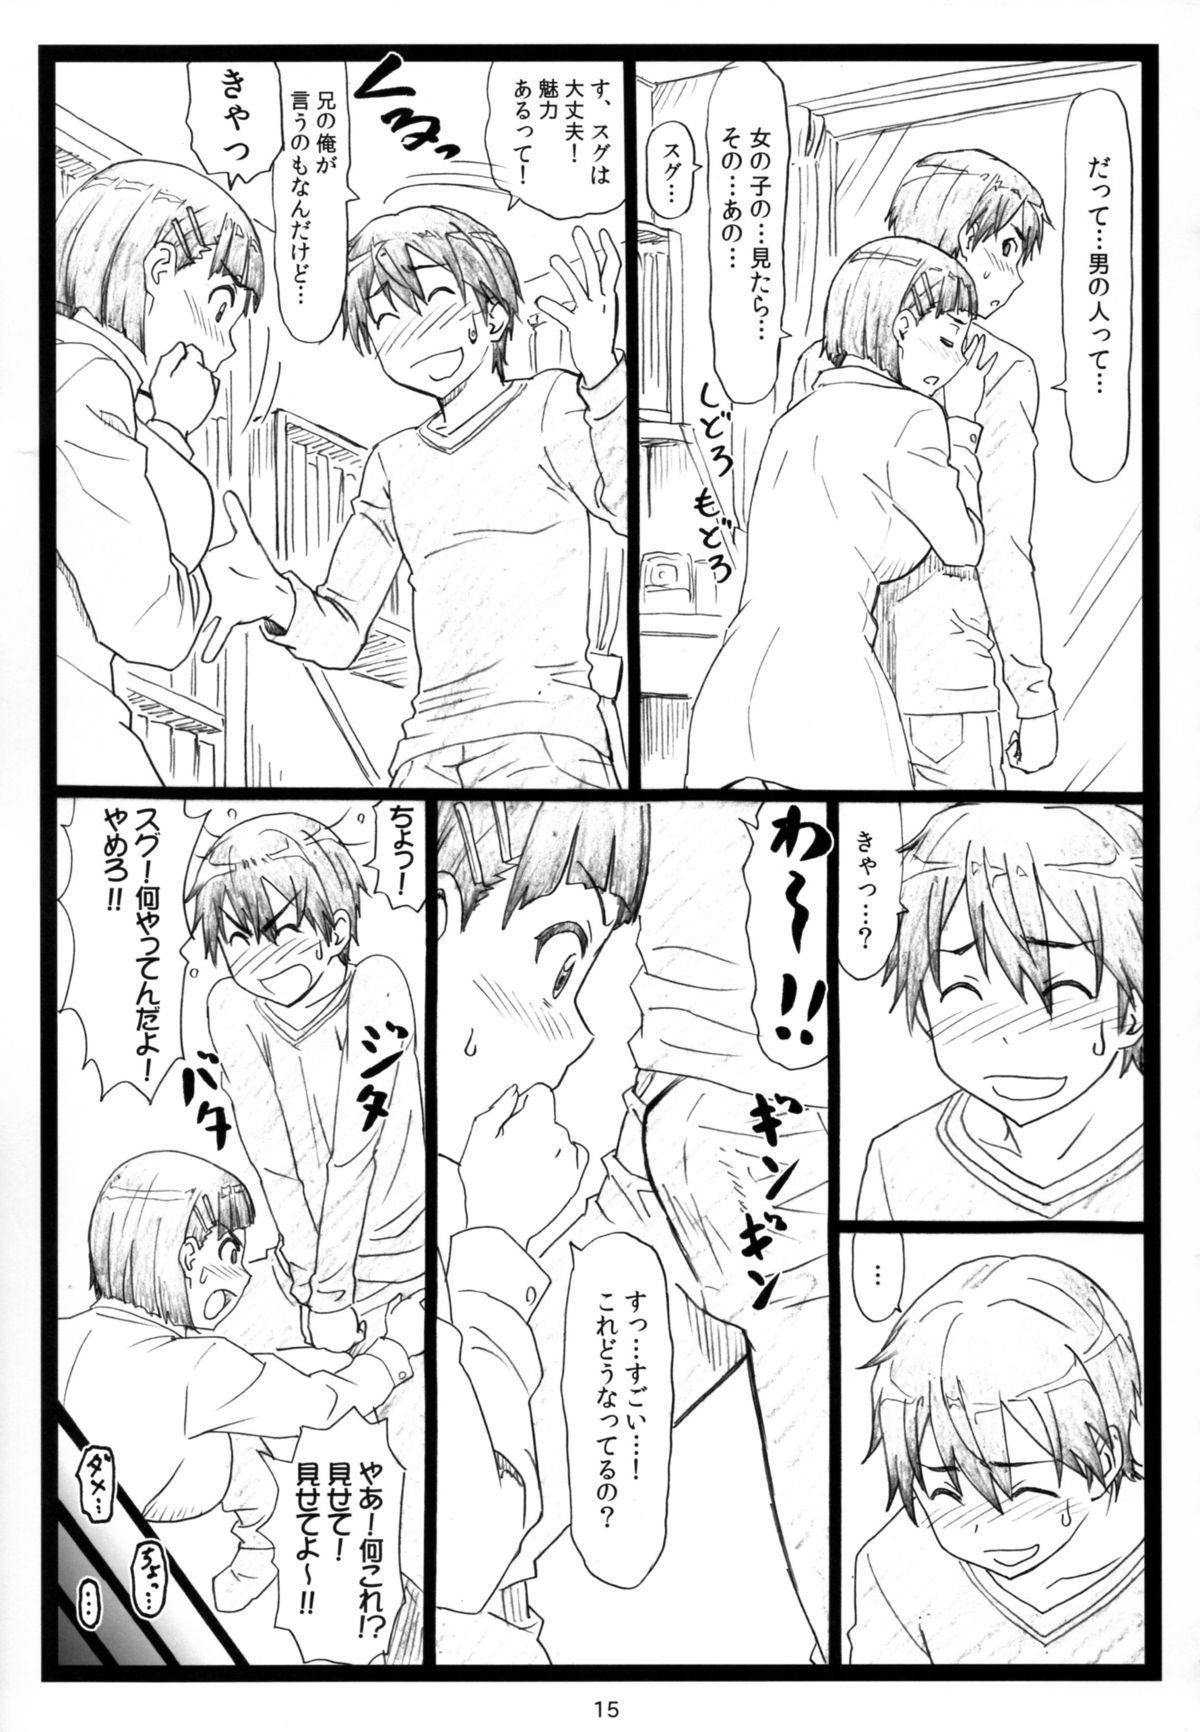 Kuzuha 14